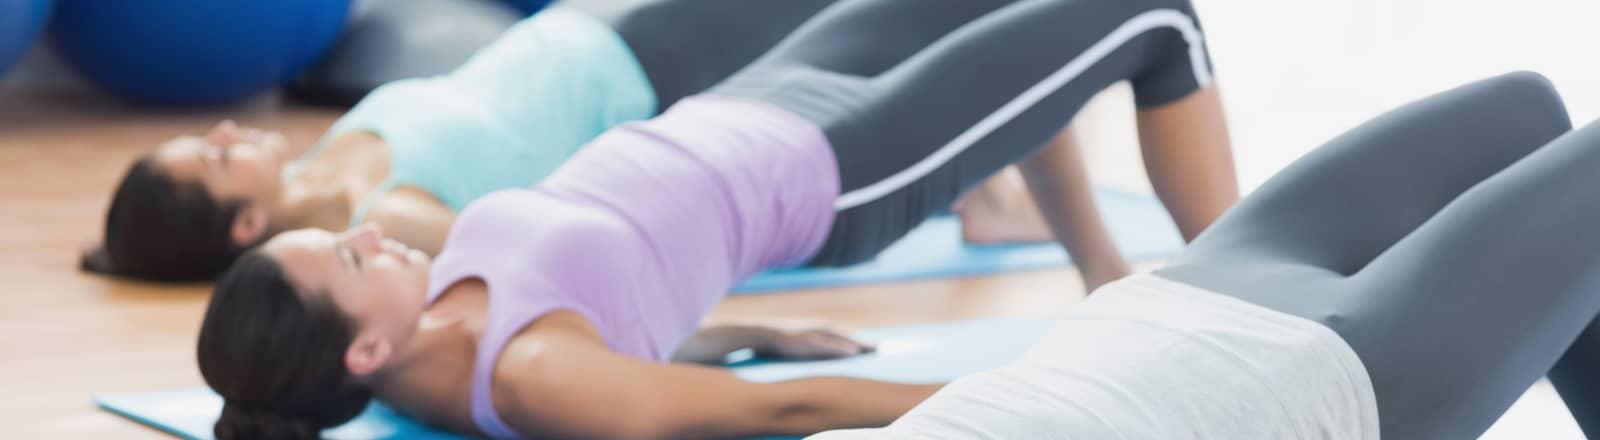 grupos y clases de yoga 03ac1af7c99e